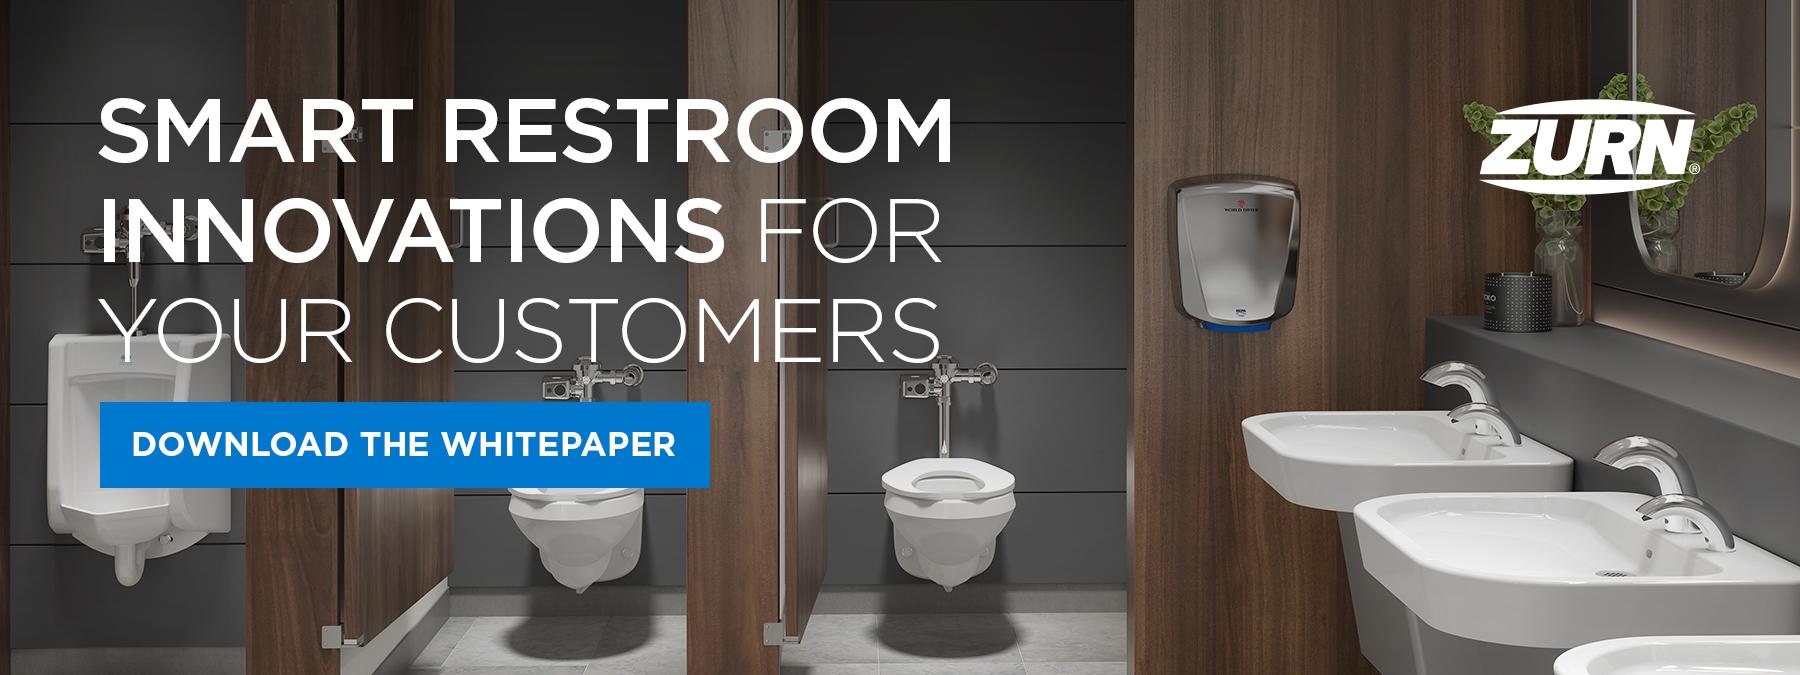 000-052 Smart Restroom Innovations Whitepaper General Graphic 1800x675